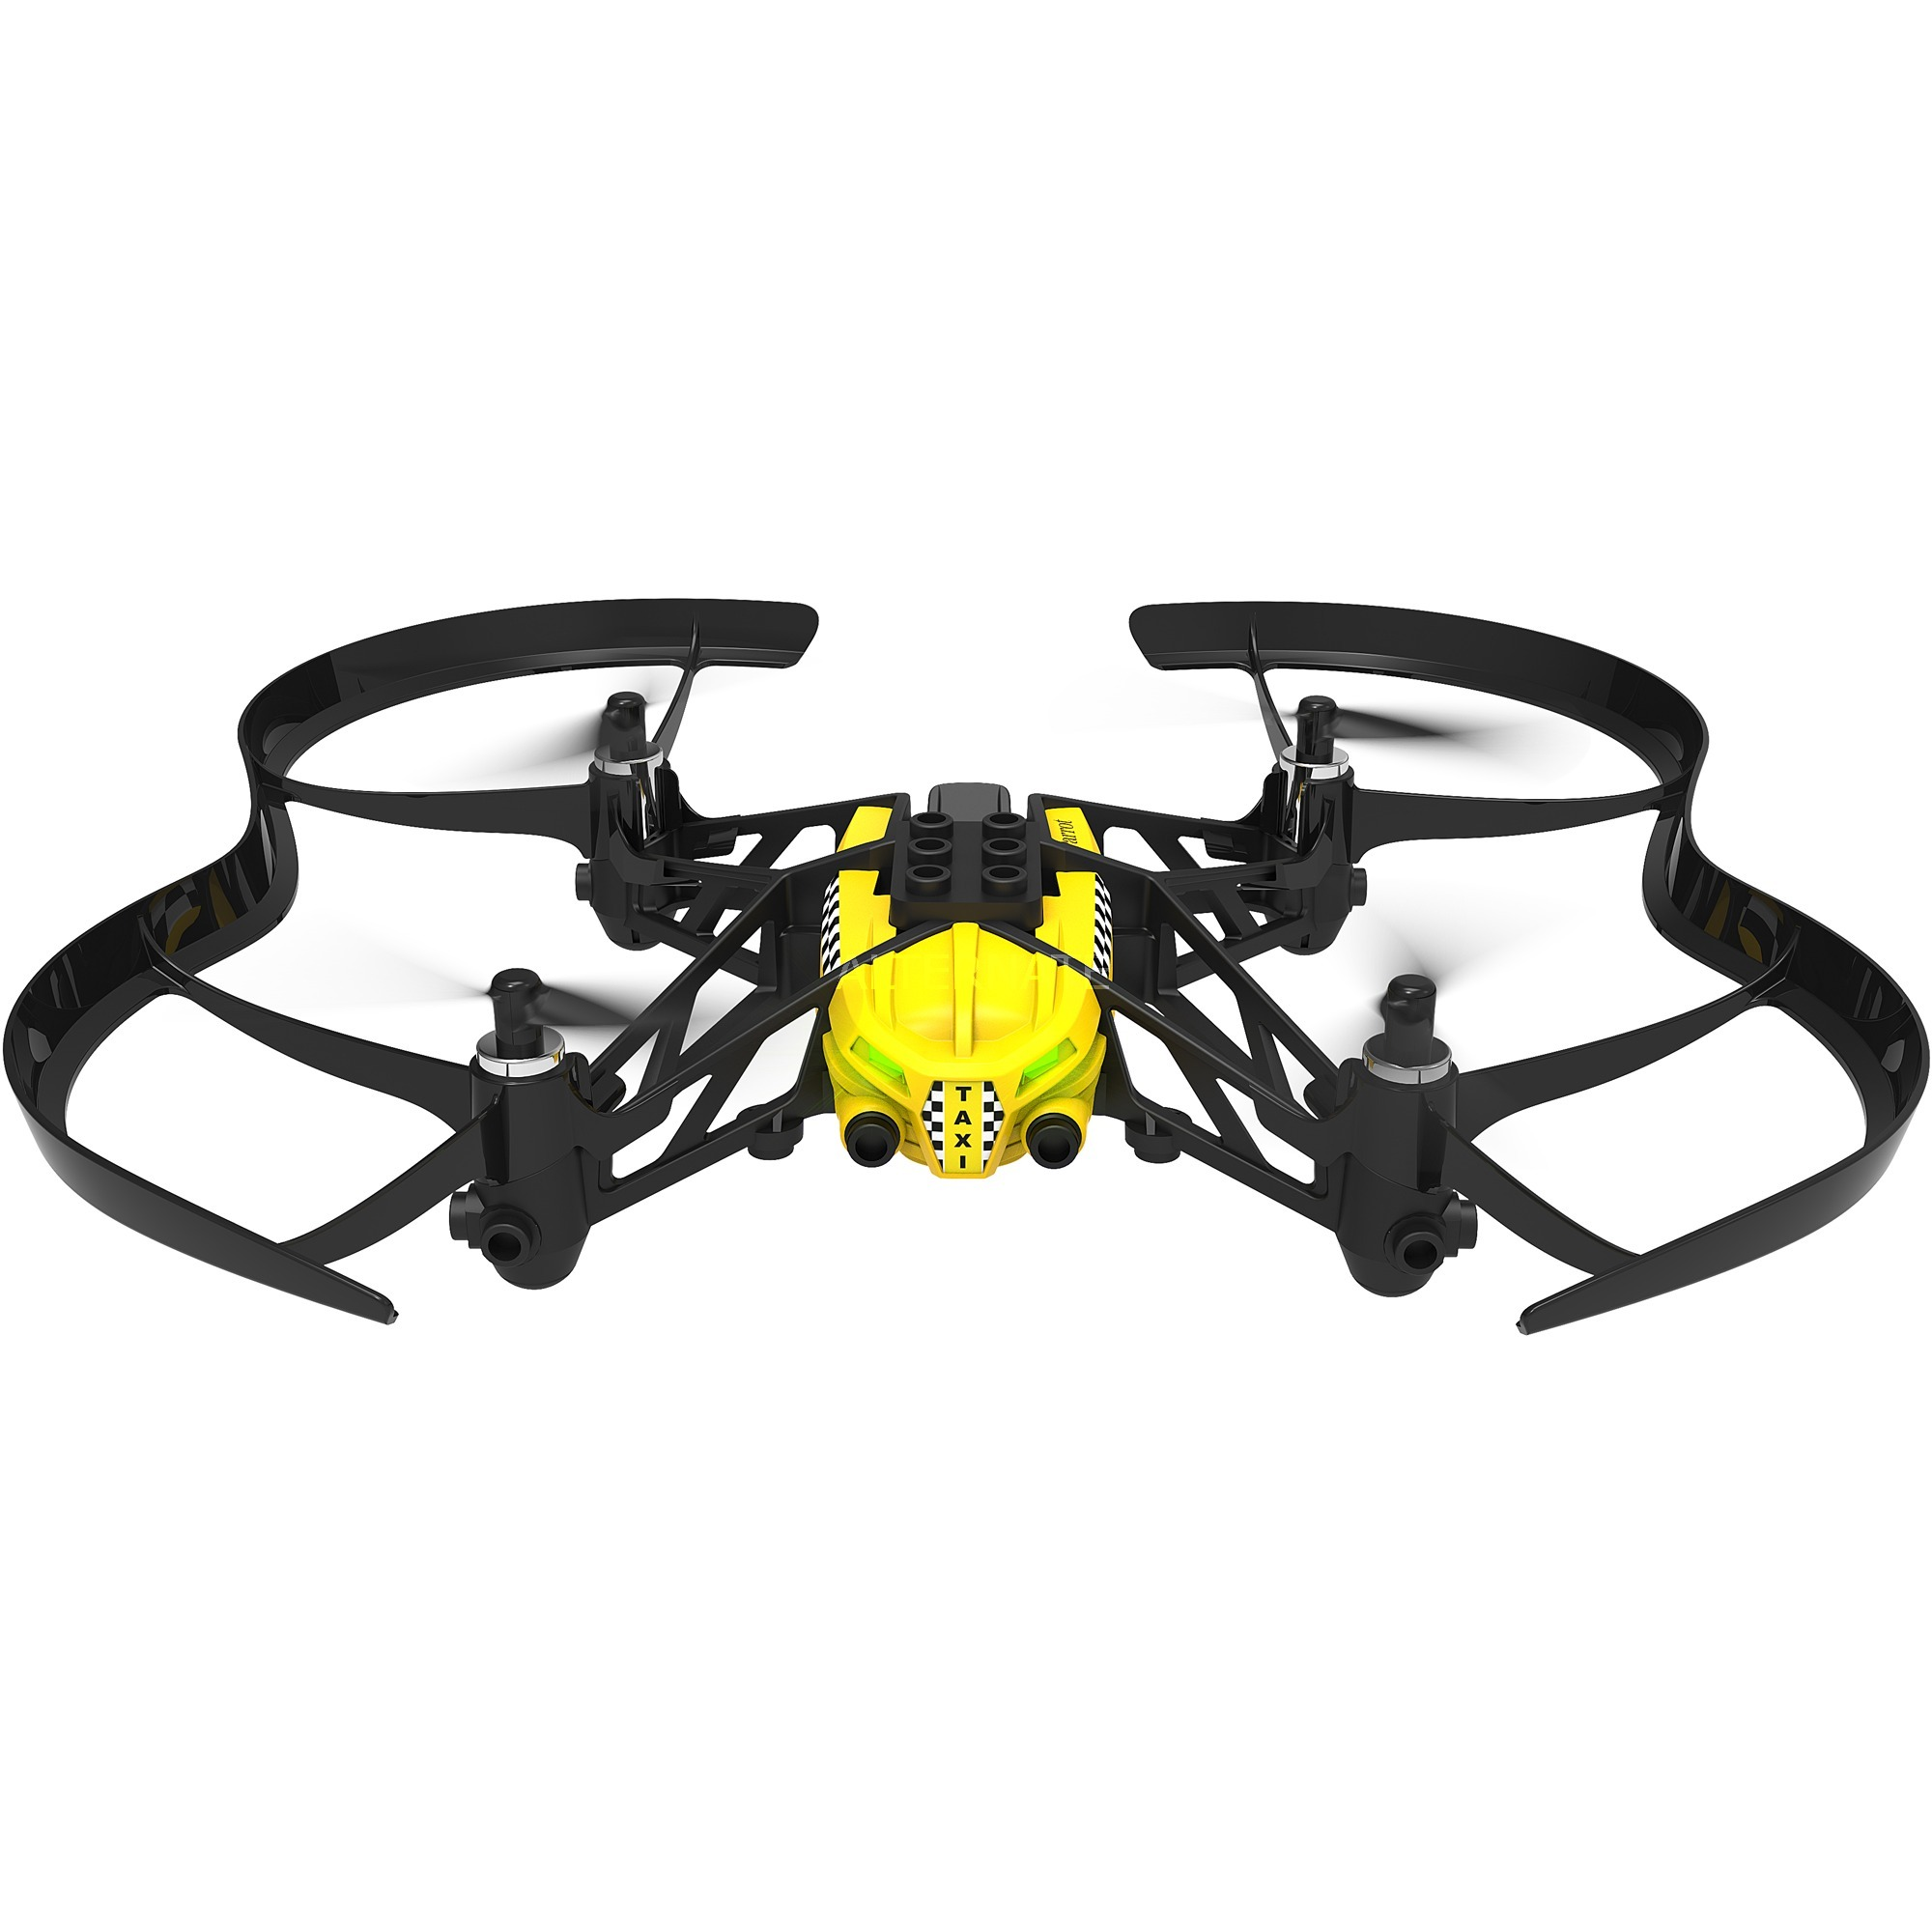 Airborne Cargo Travis 480 x 640Pixeles Negro, Amarillo dron con cámara, avión por control remoto